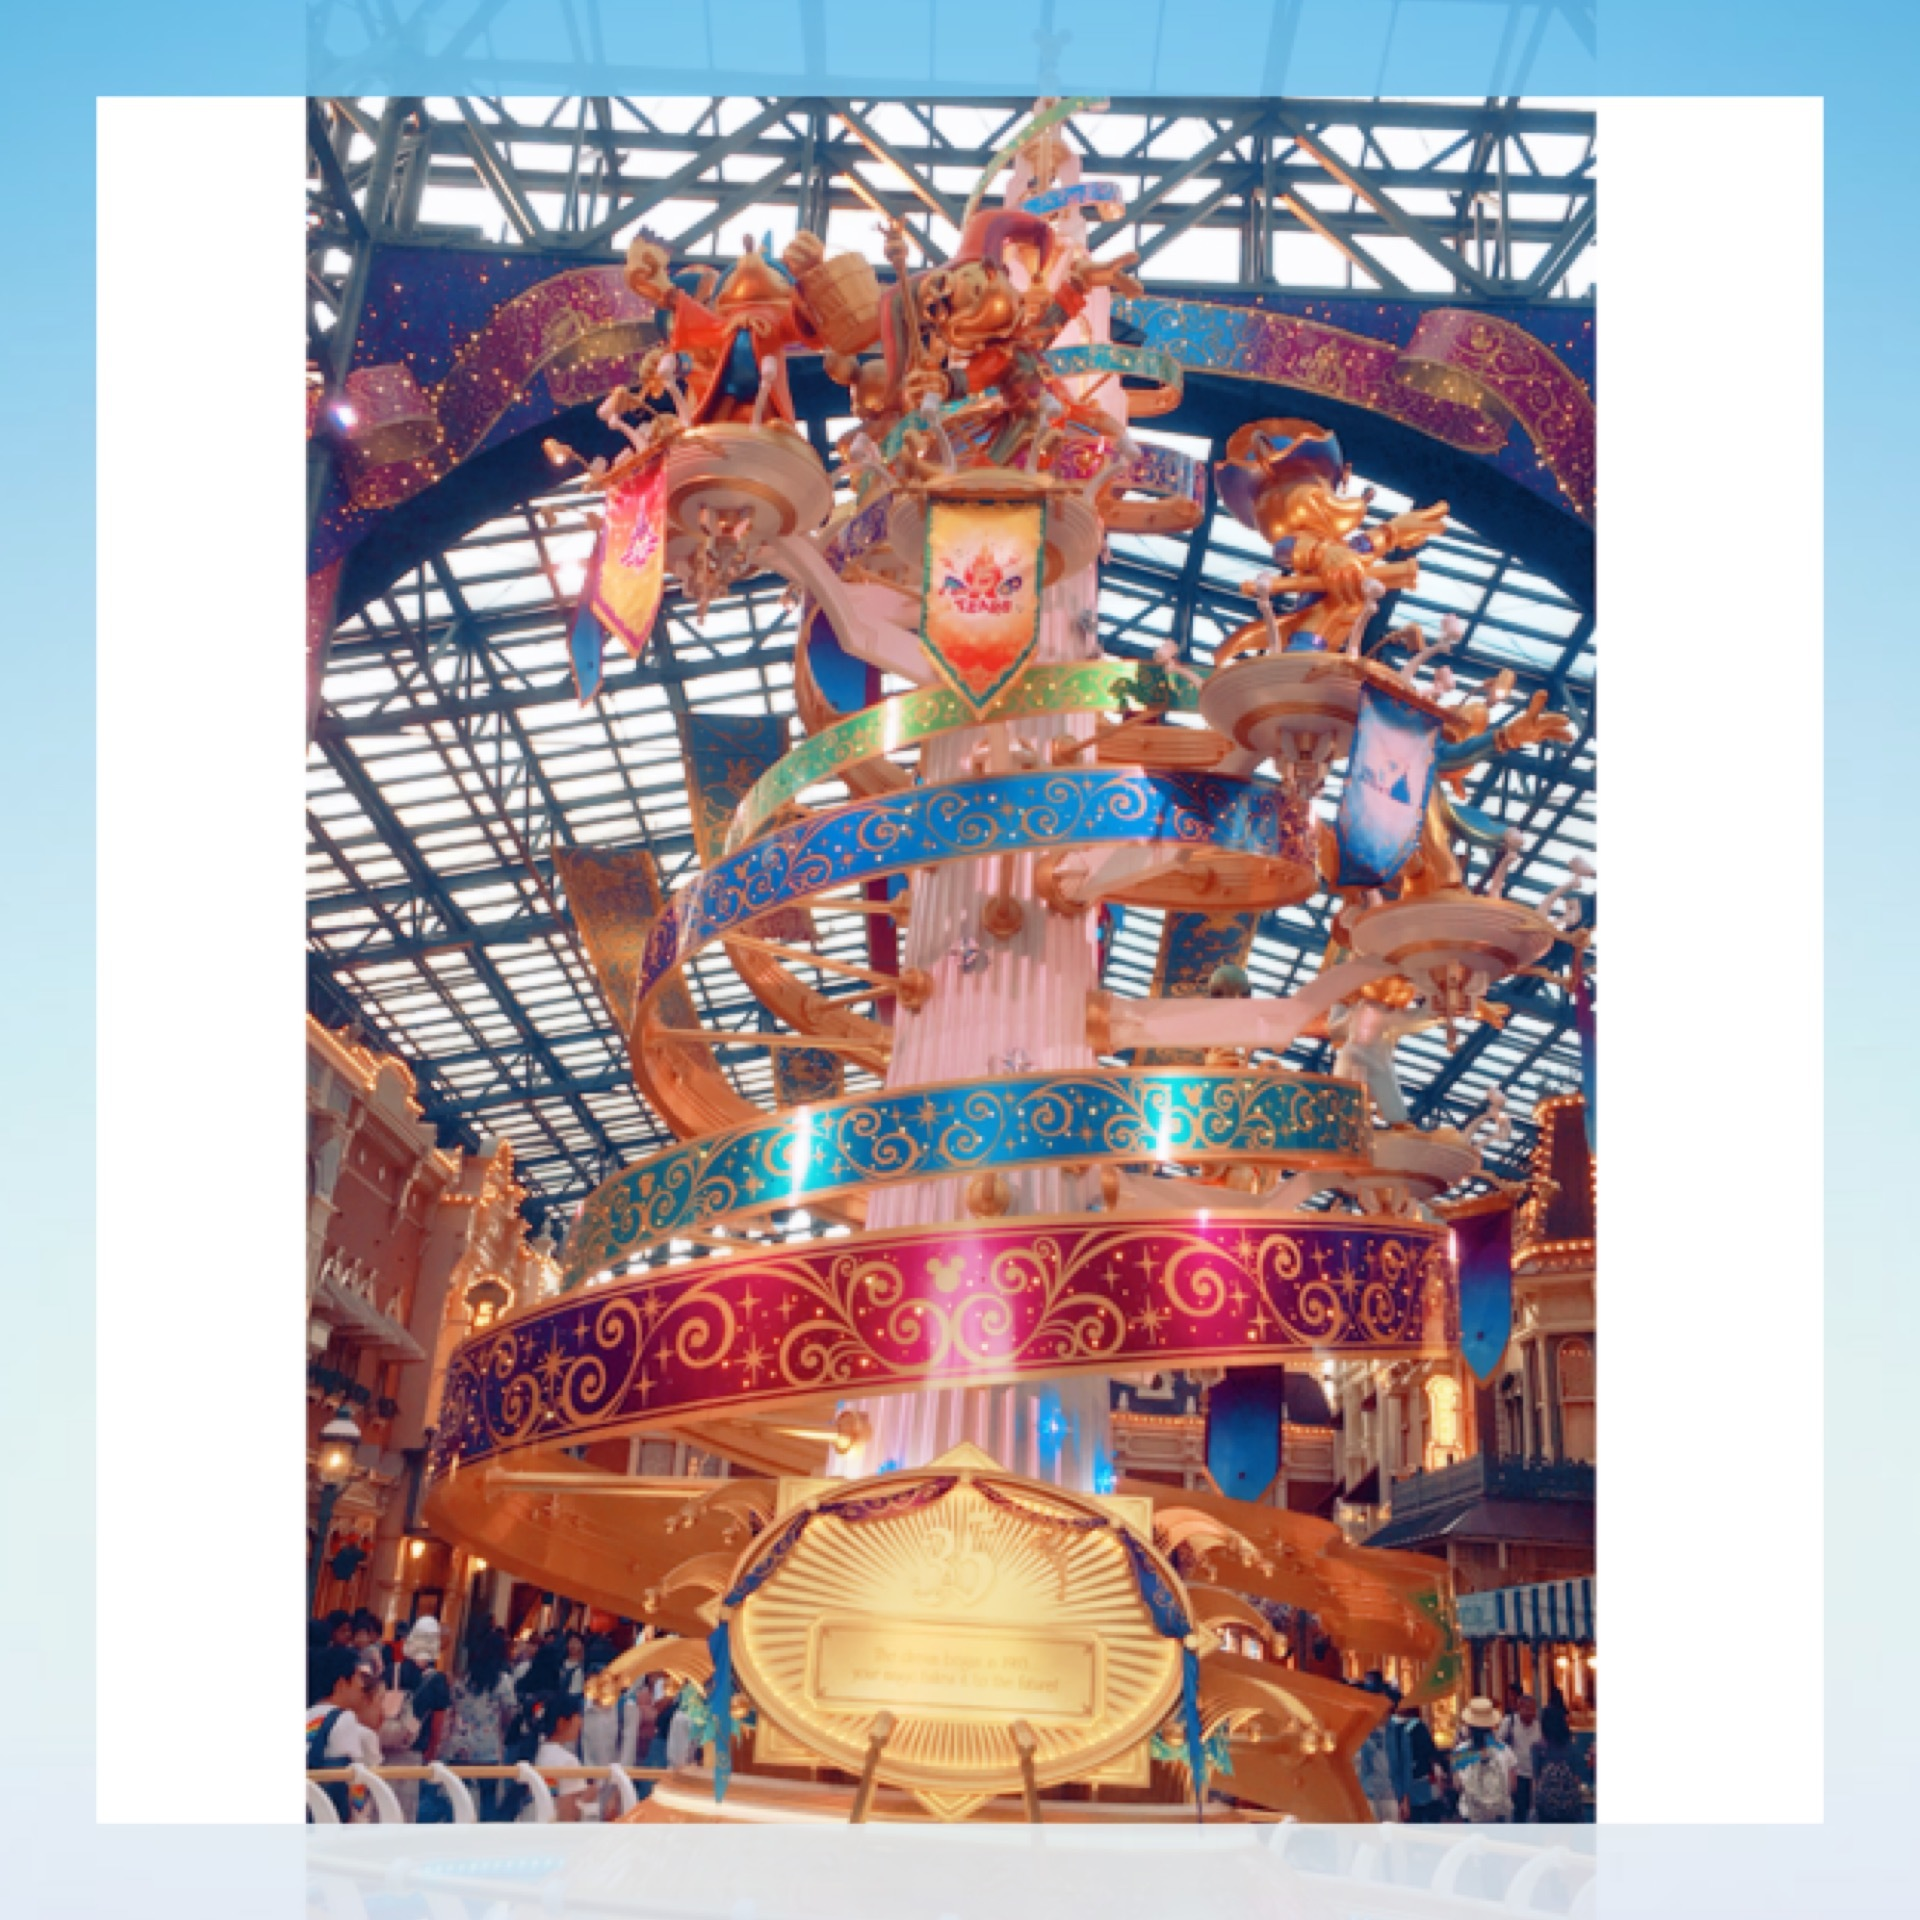 Tokyo Disneyland《 35 Happiest Gelebration! 》に行ってきました♫_1_3-2